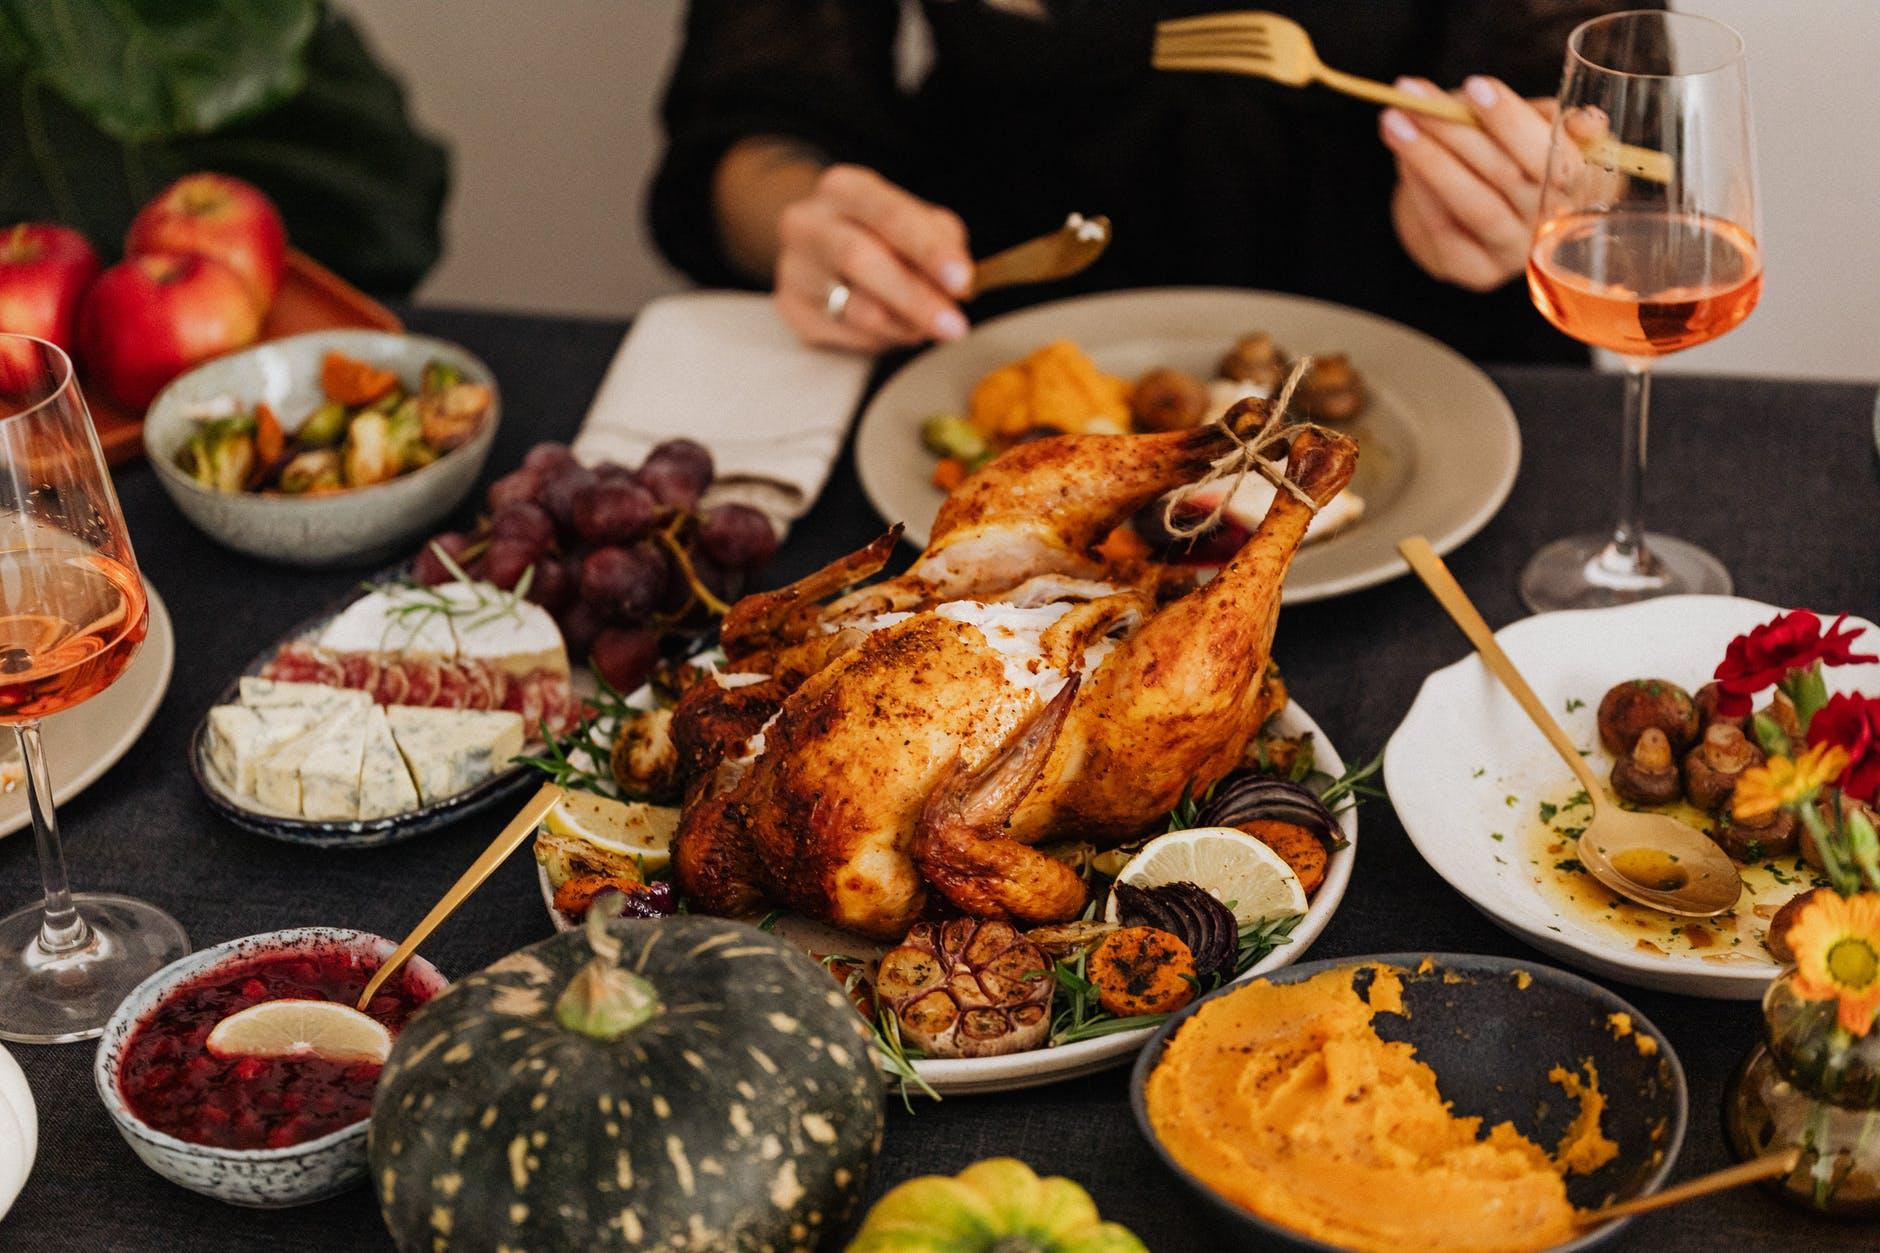 roasted turkey on white ceramic plate